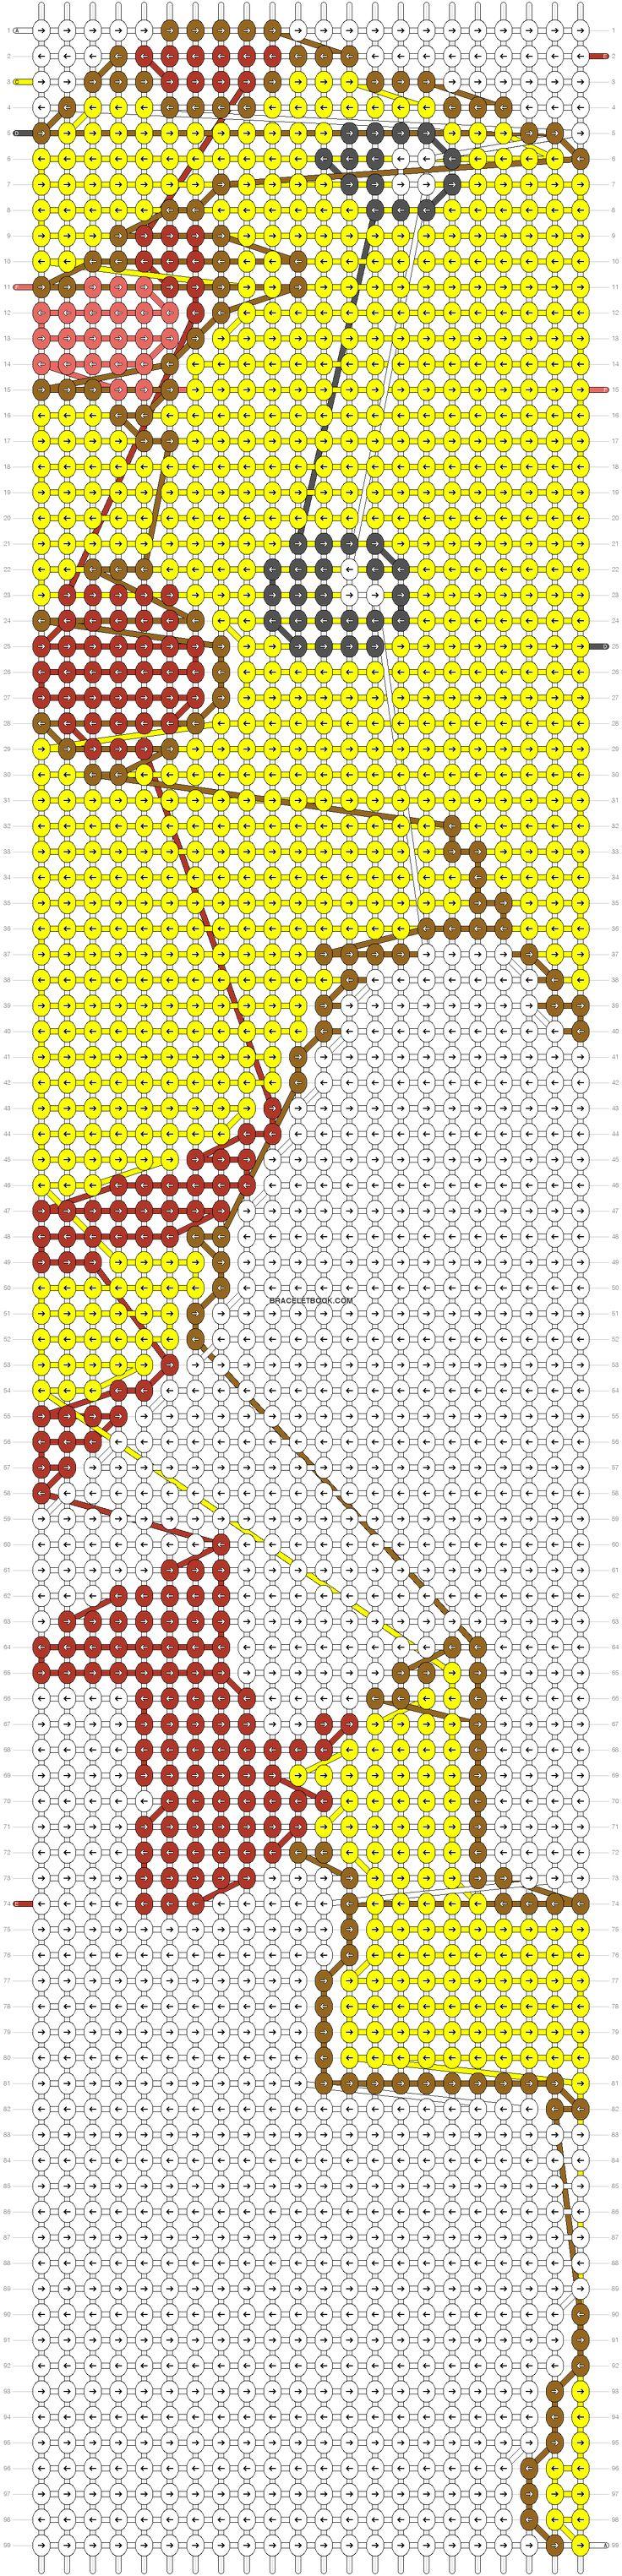 Alpha Friendship Bracelet Pattern Added By Pokemon, Pikachu, Gamer, Cute,  Animal